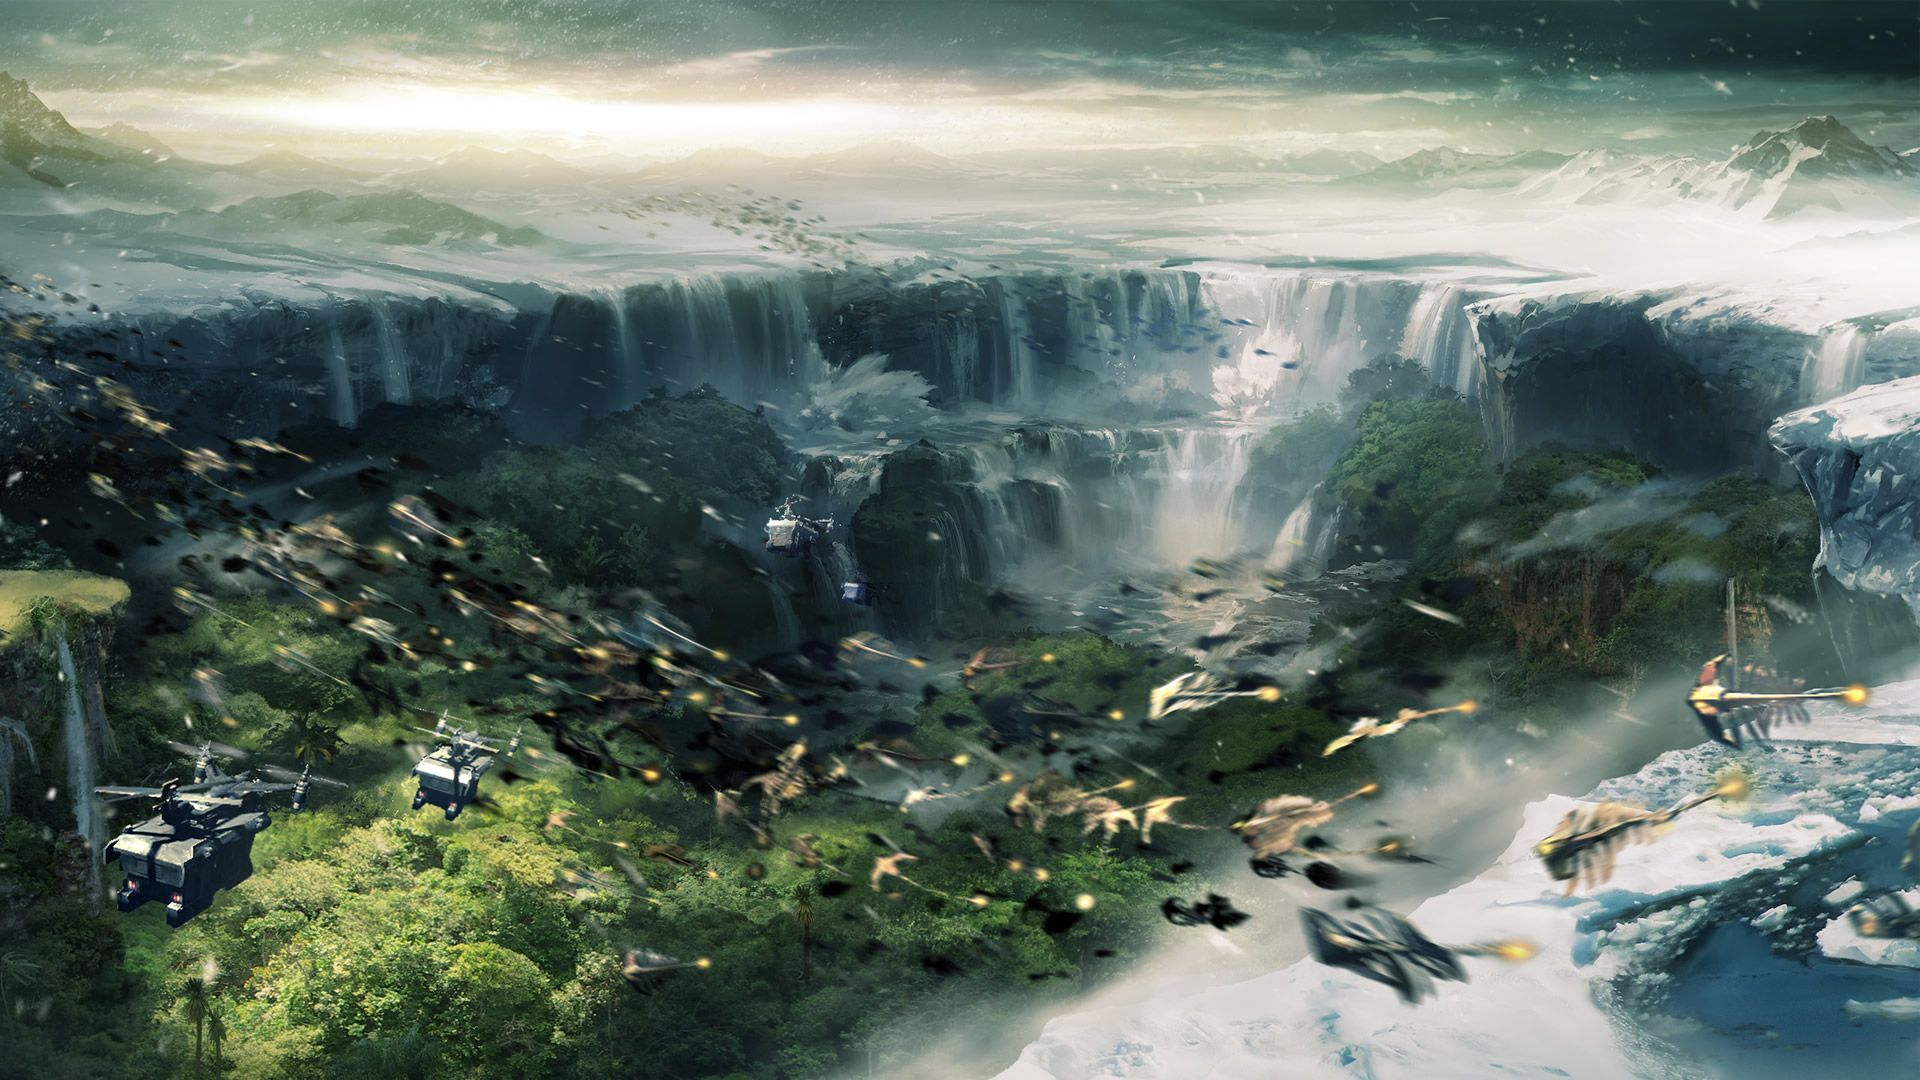 Lost Planet 2 wallpaper 2 1920x1080